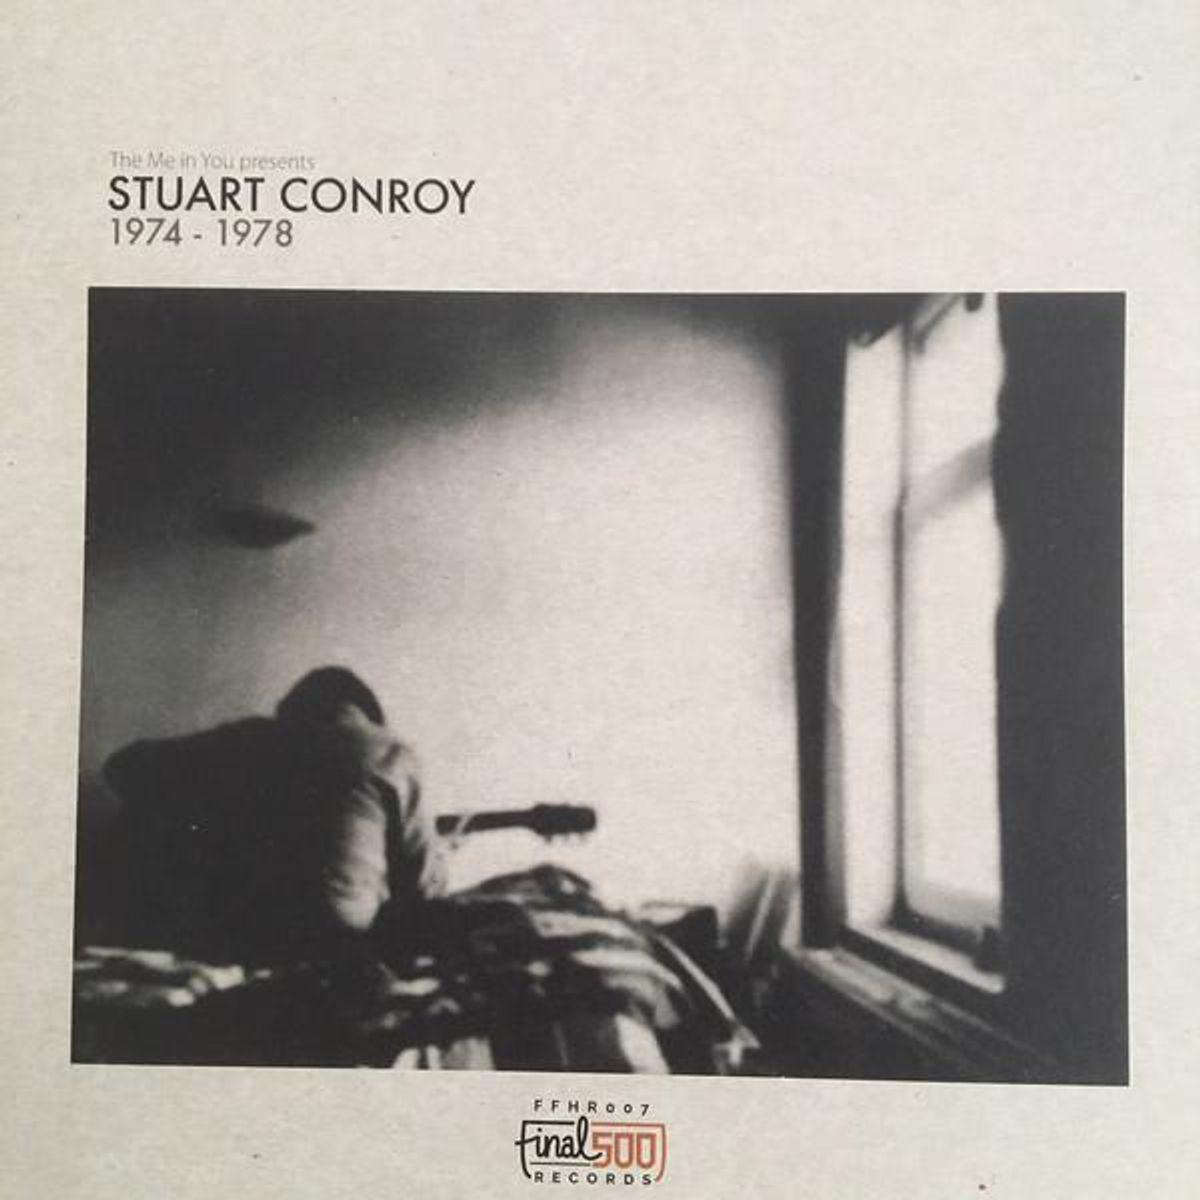 Stuart Conroy (1974 - 1978)